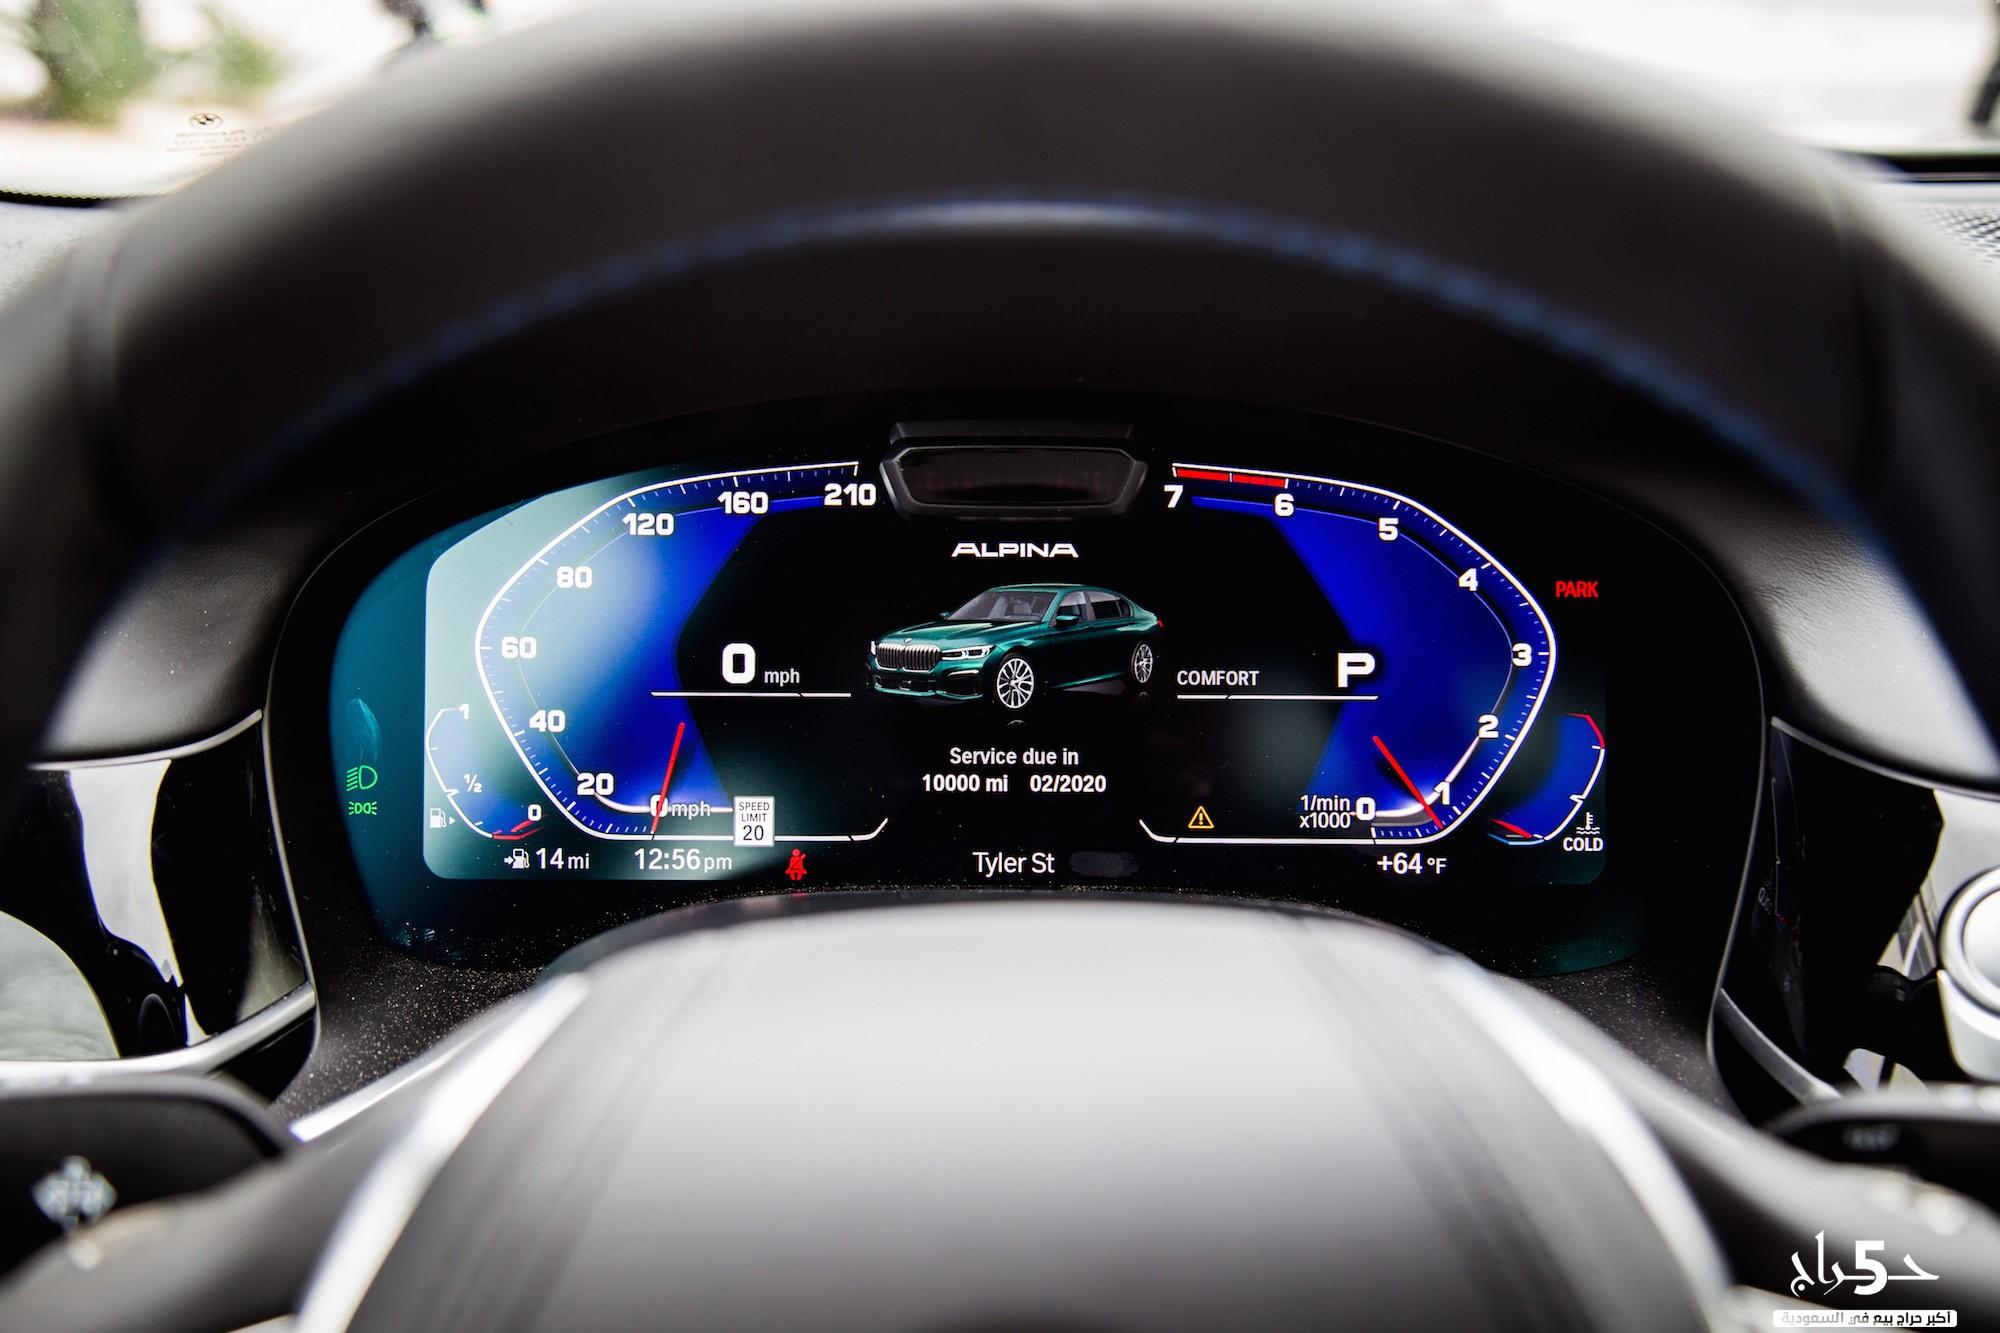 برمجة جميع مميزات بي ام دبليو CarPlay BMW احدث خرائط ٢٠٢٢